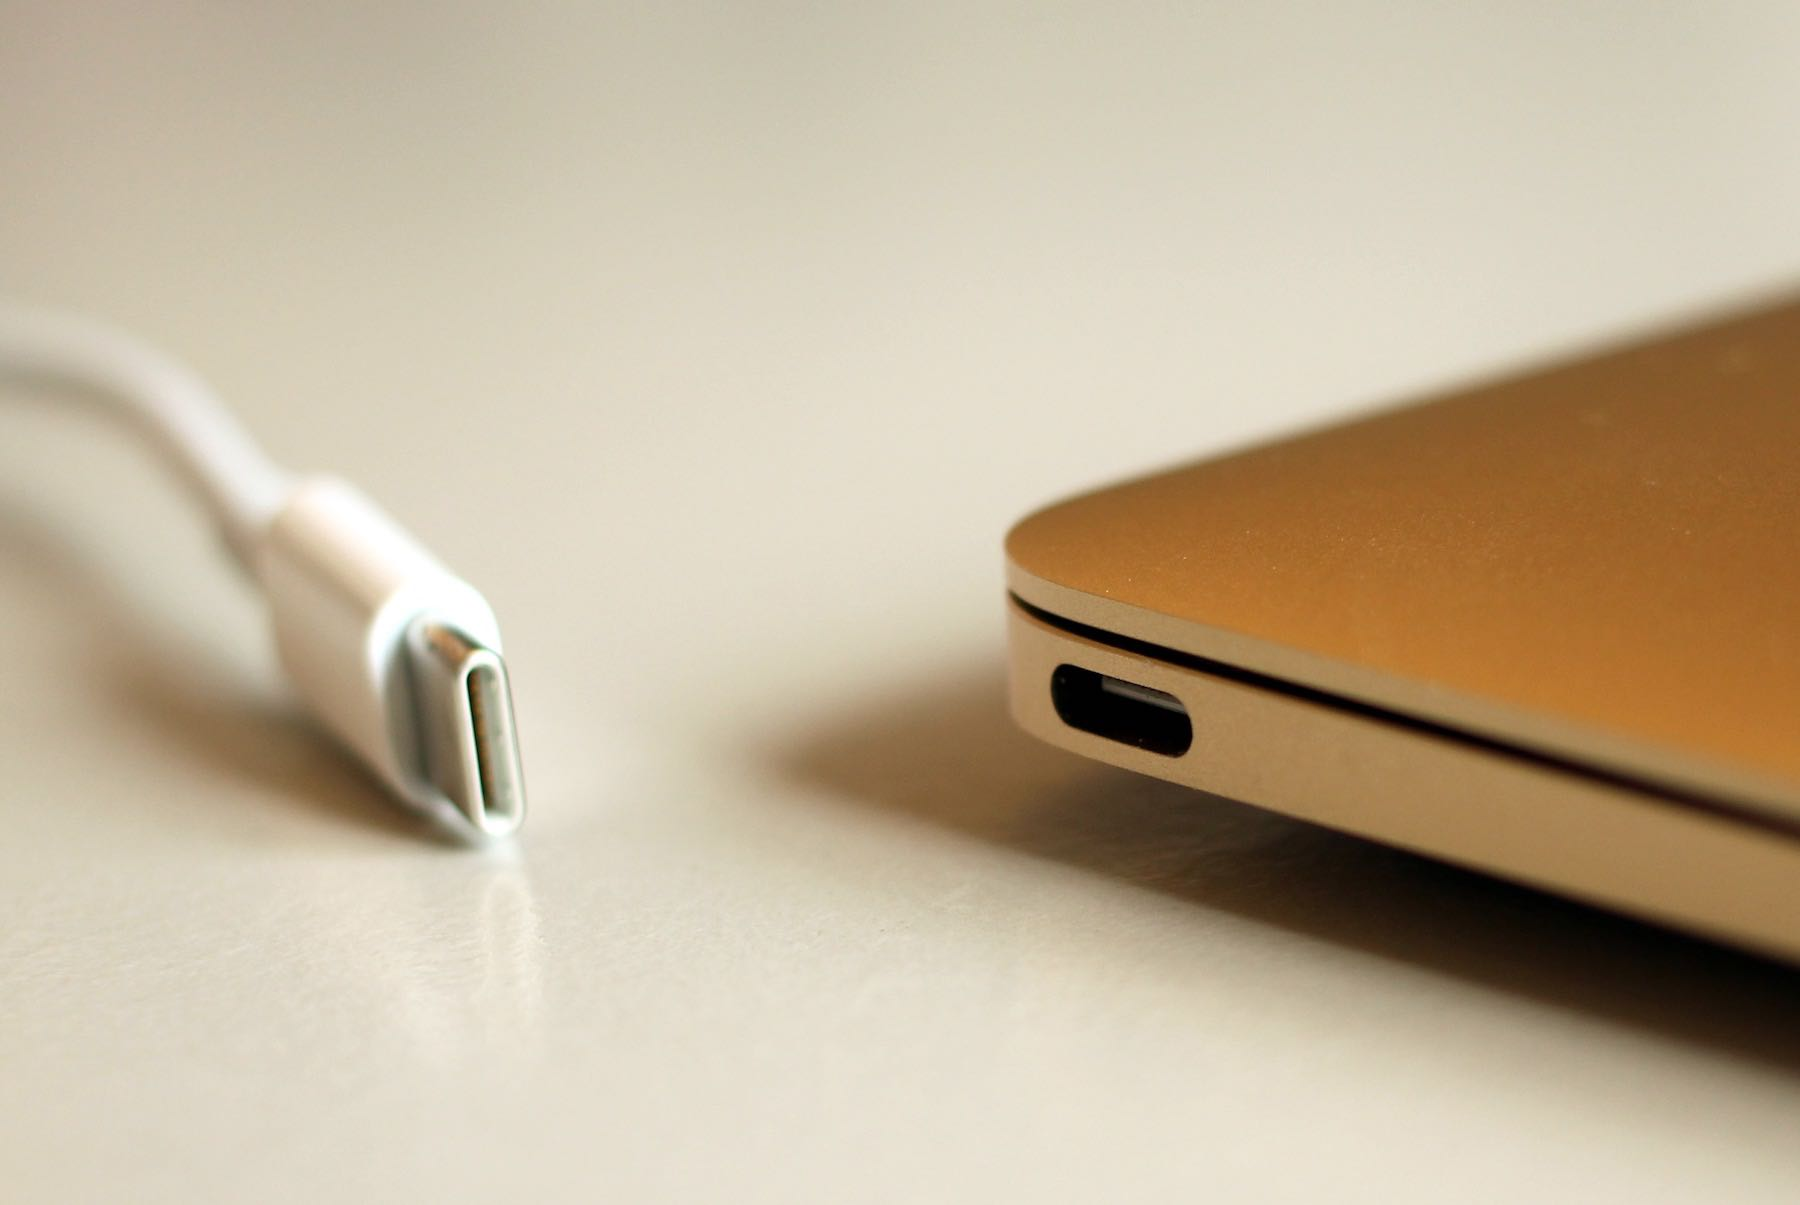 USB 3.1 MacBook Pro